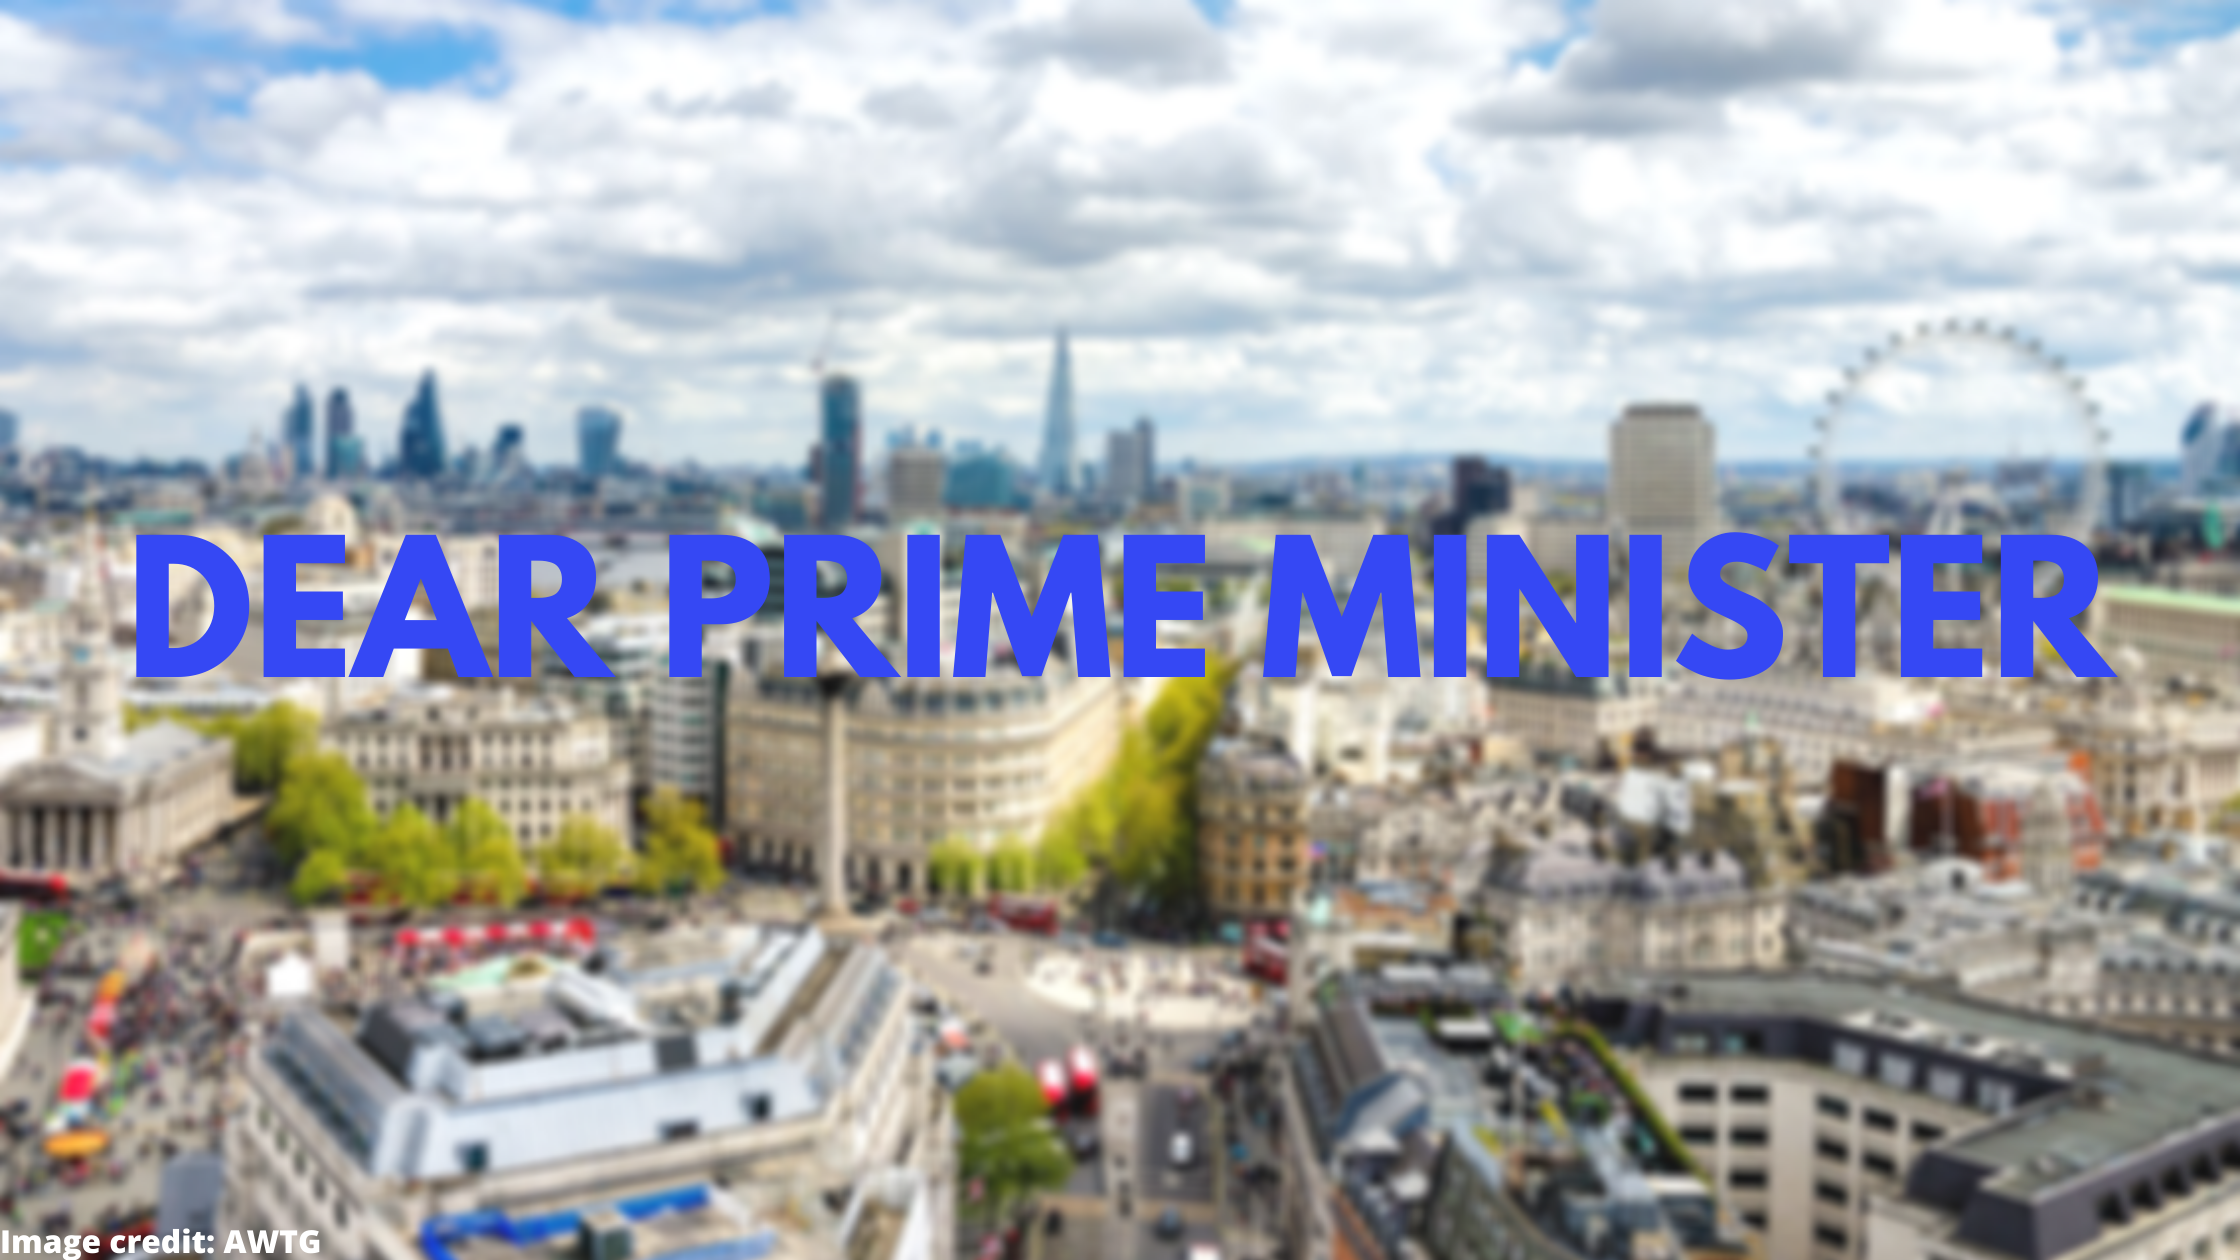 Dear Prime Minister